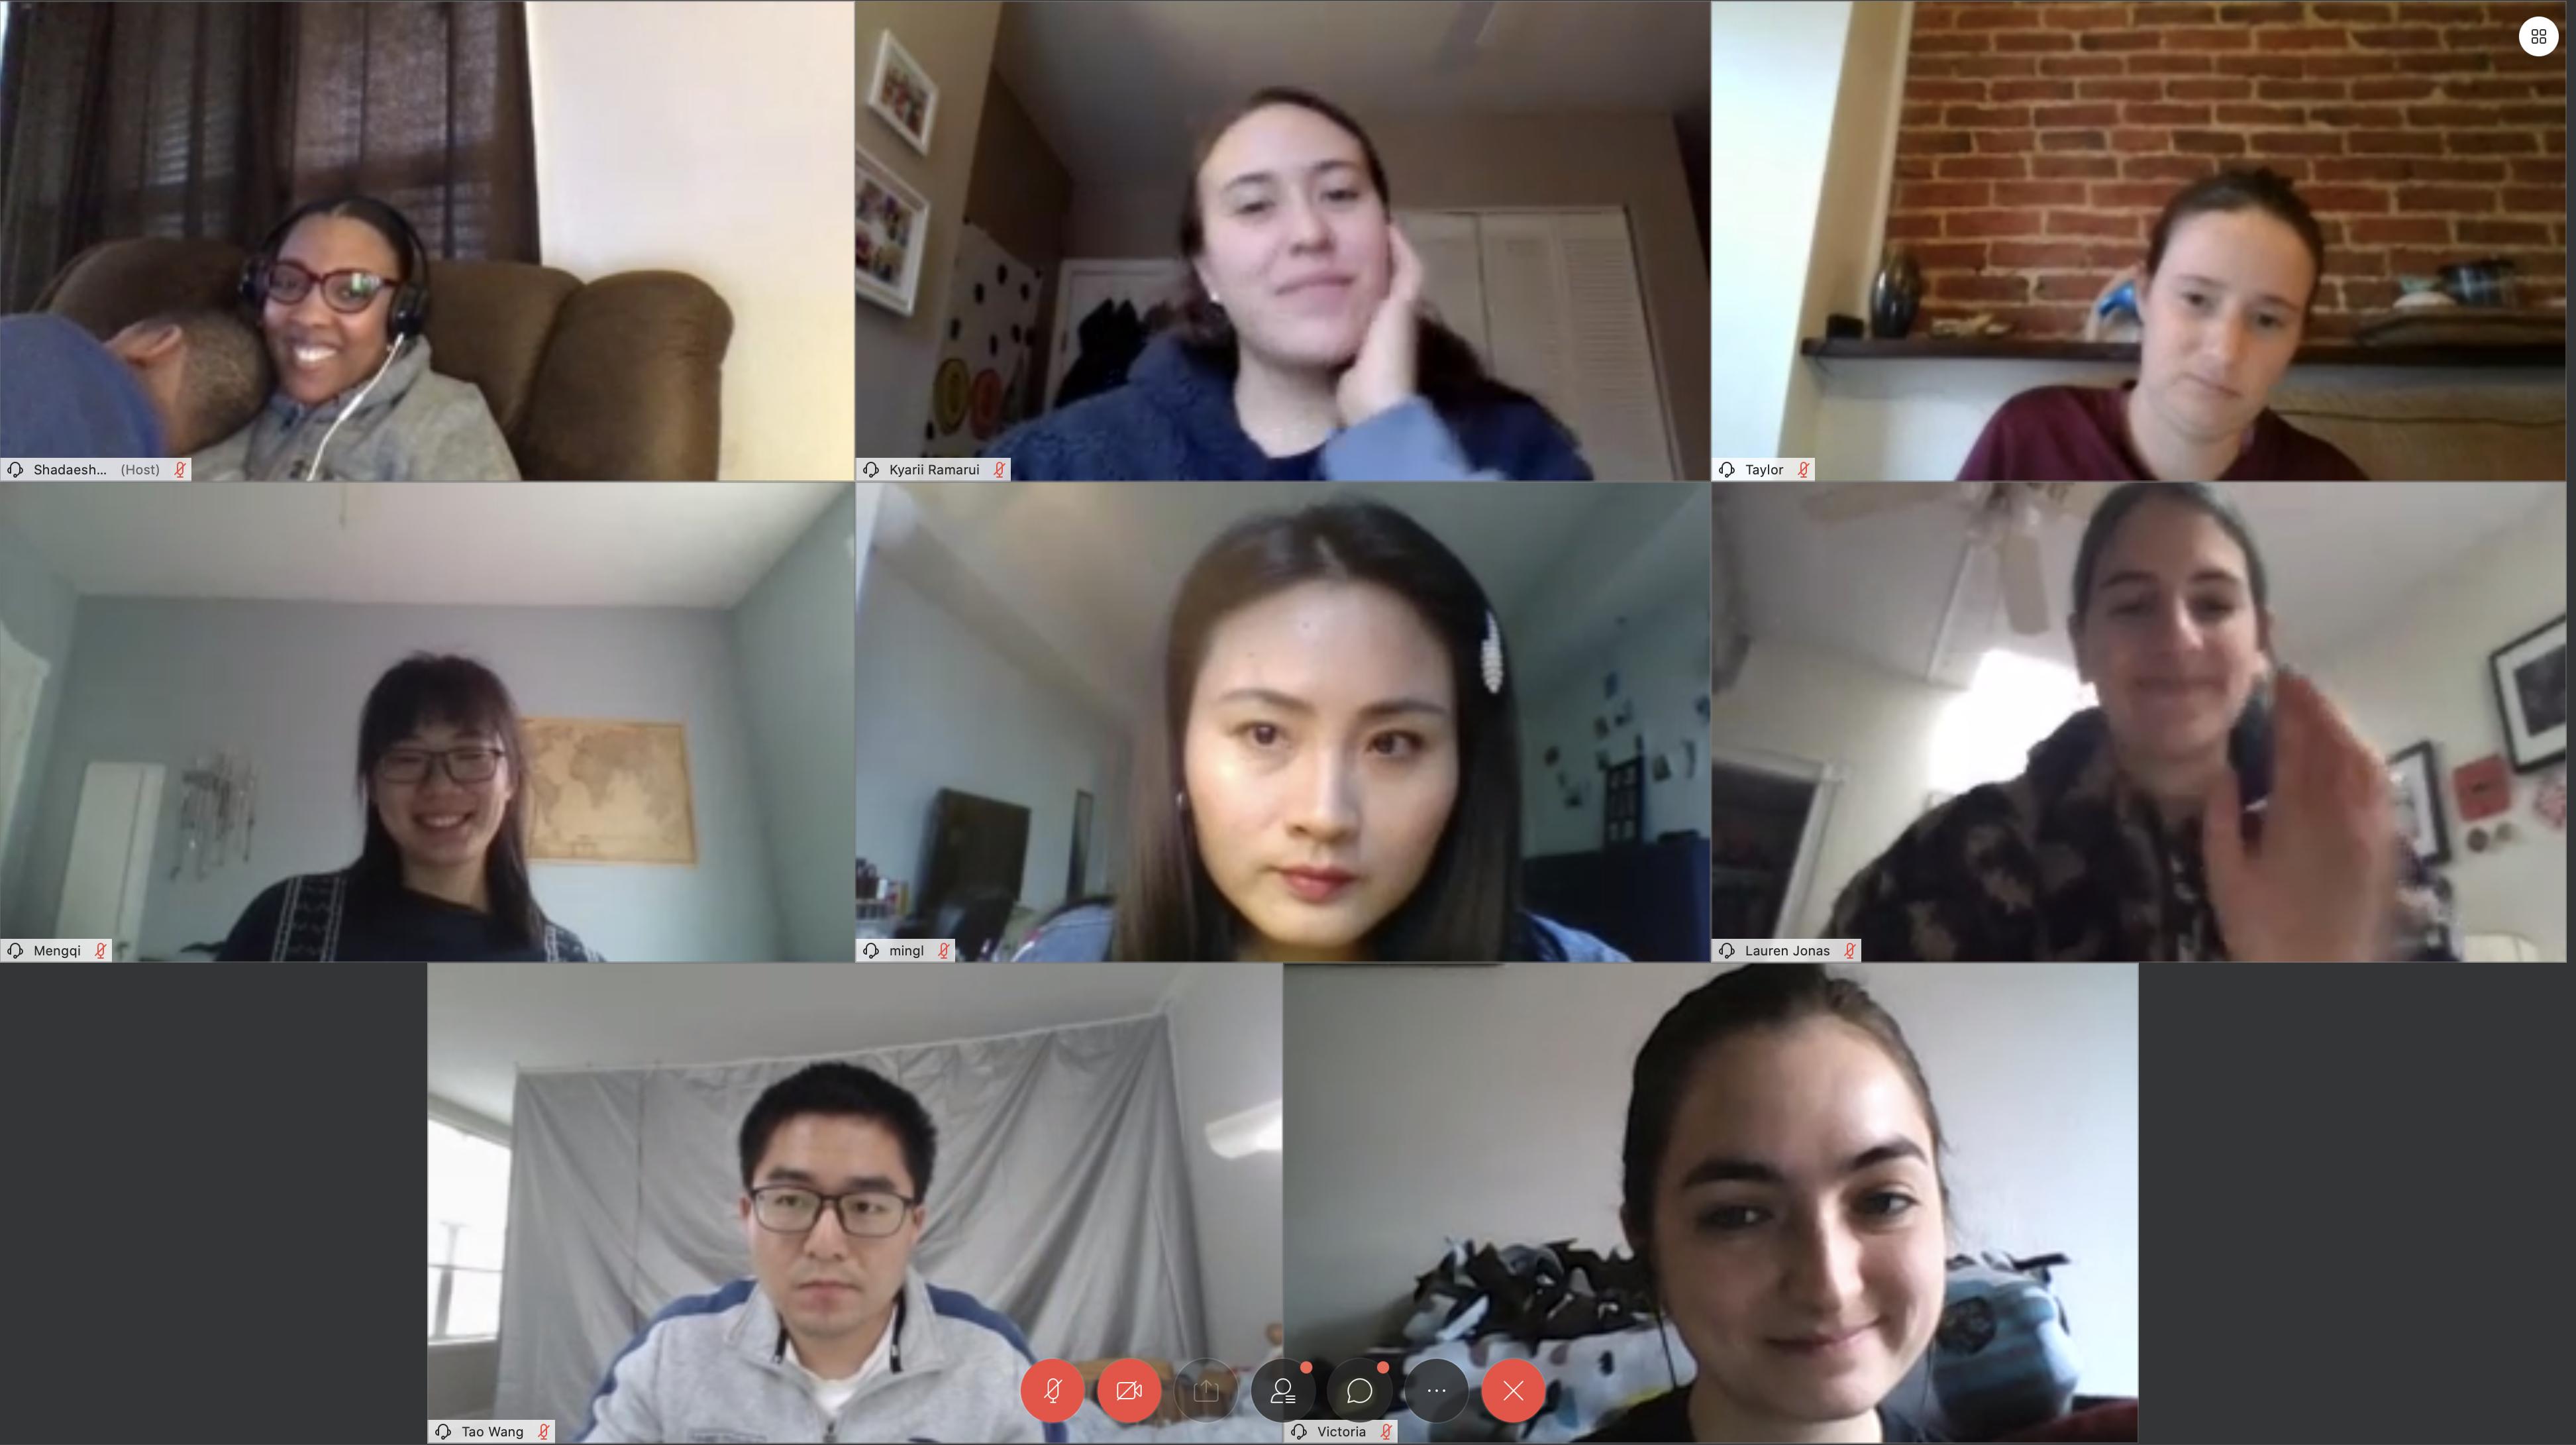 screenshot of 8 students videochatting